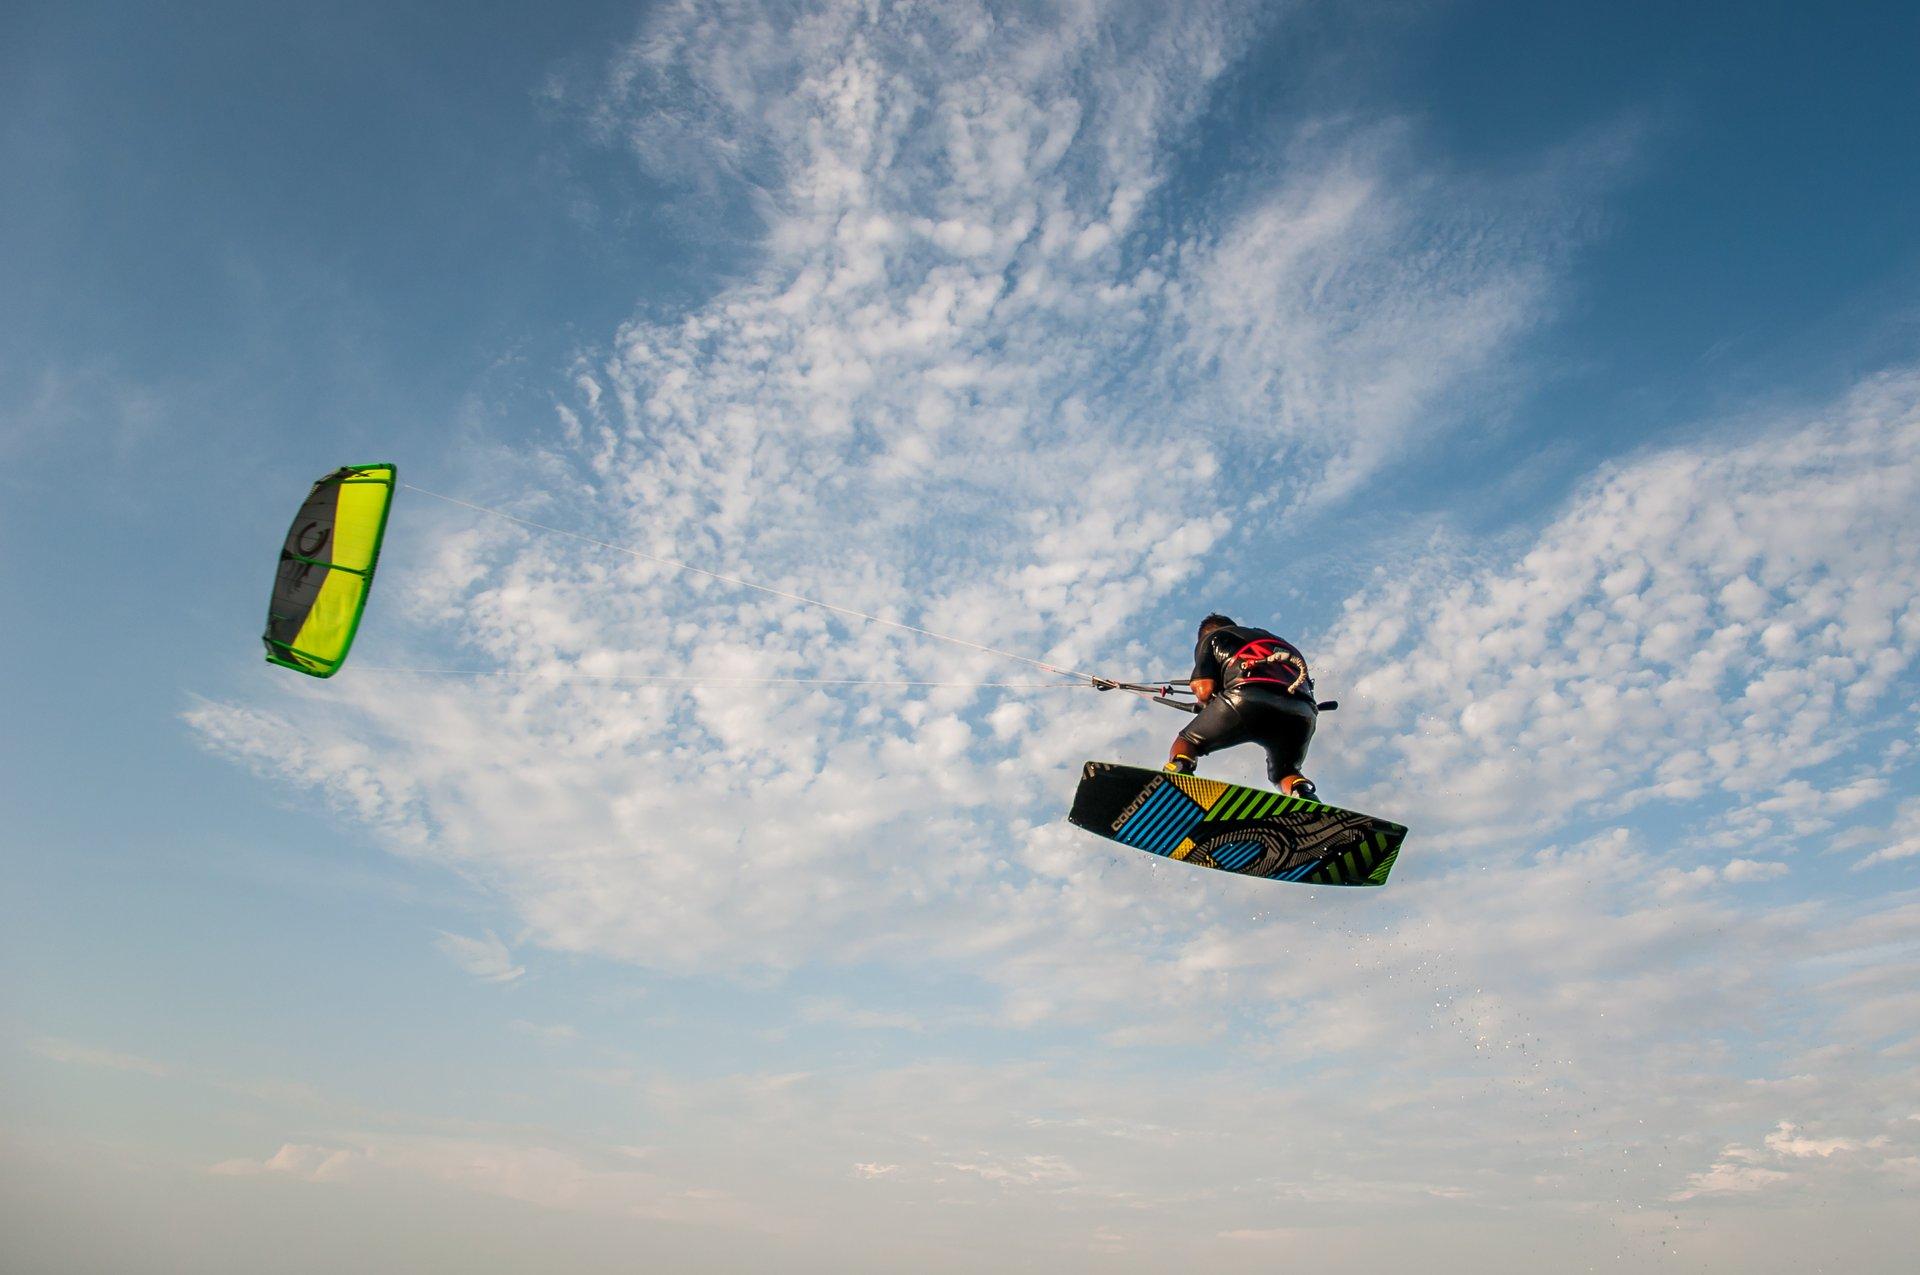 Kitesurfing and Windsurfing in Peru 2020 - Best Time